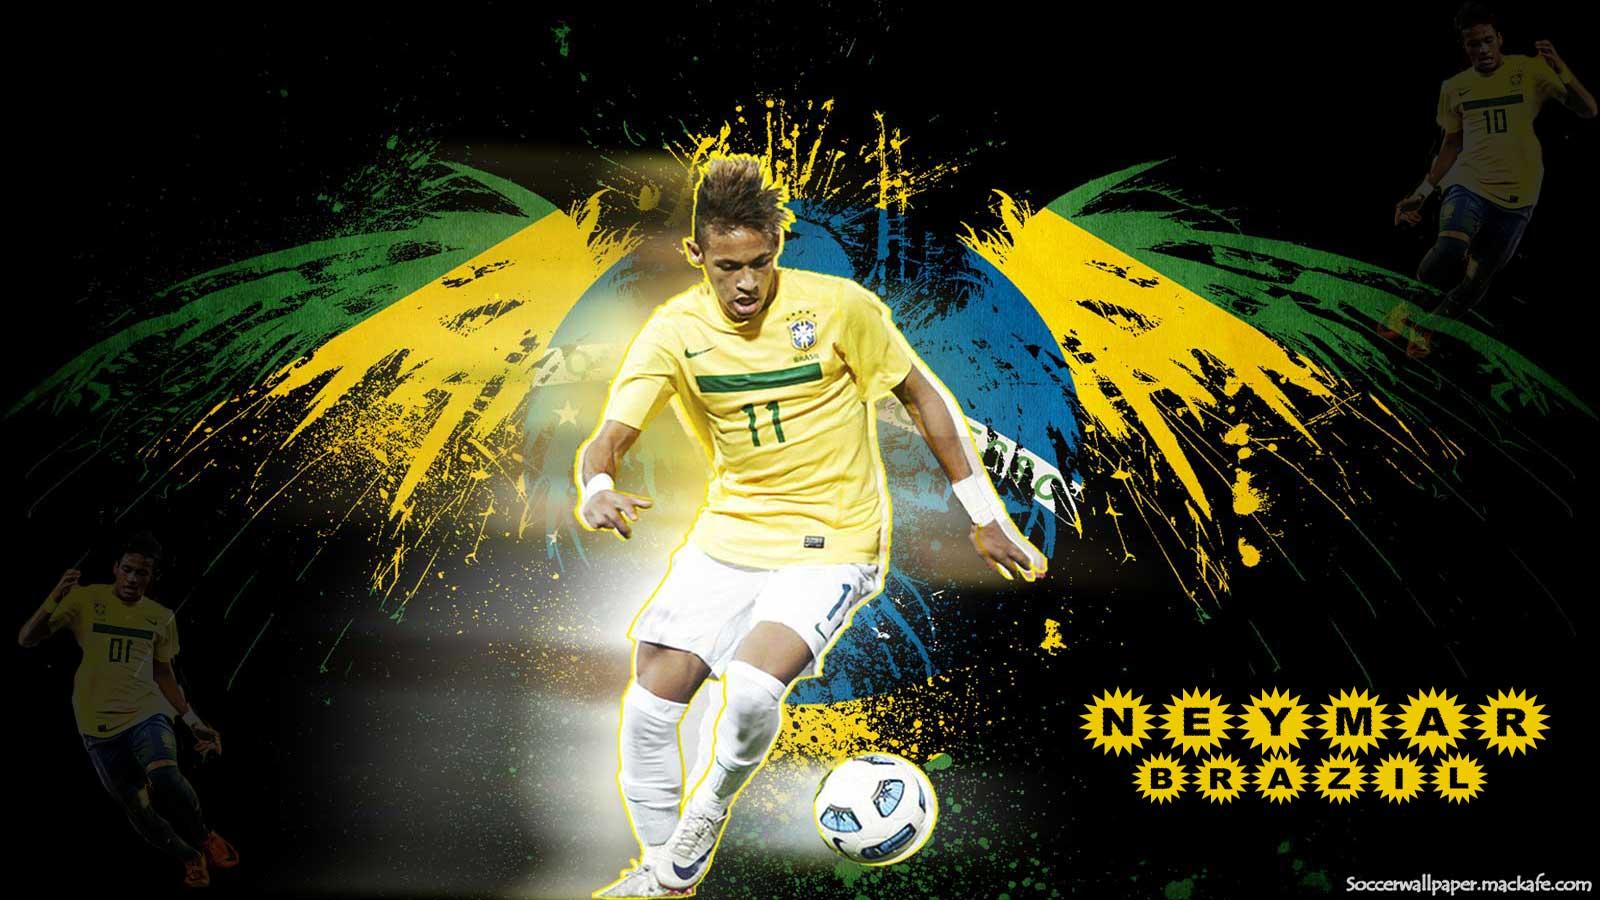 neymar wallpapers best sport wallpapers